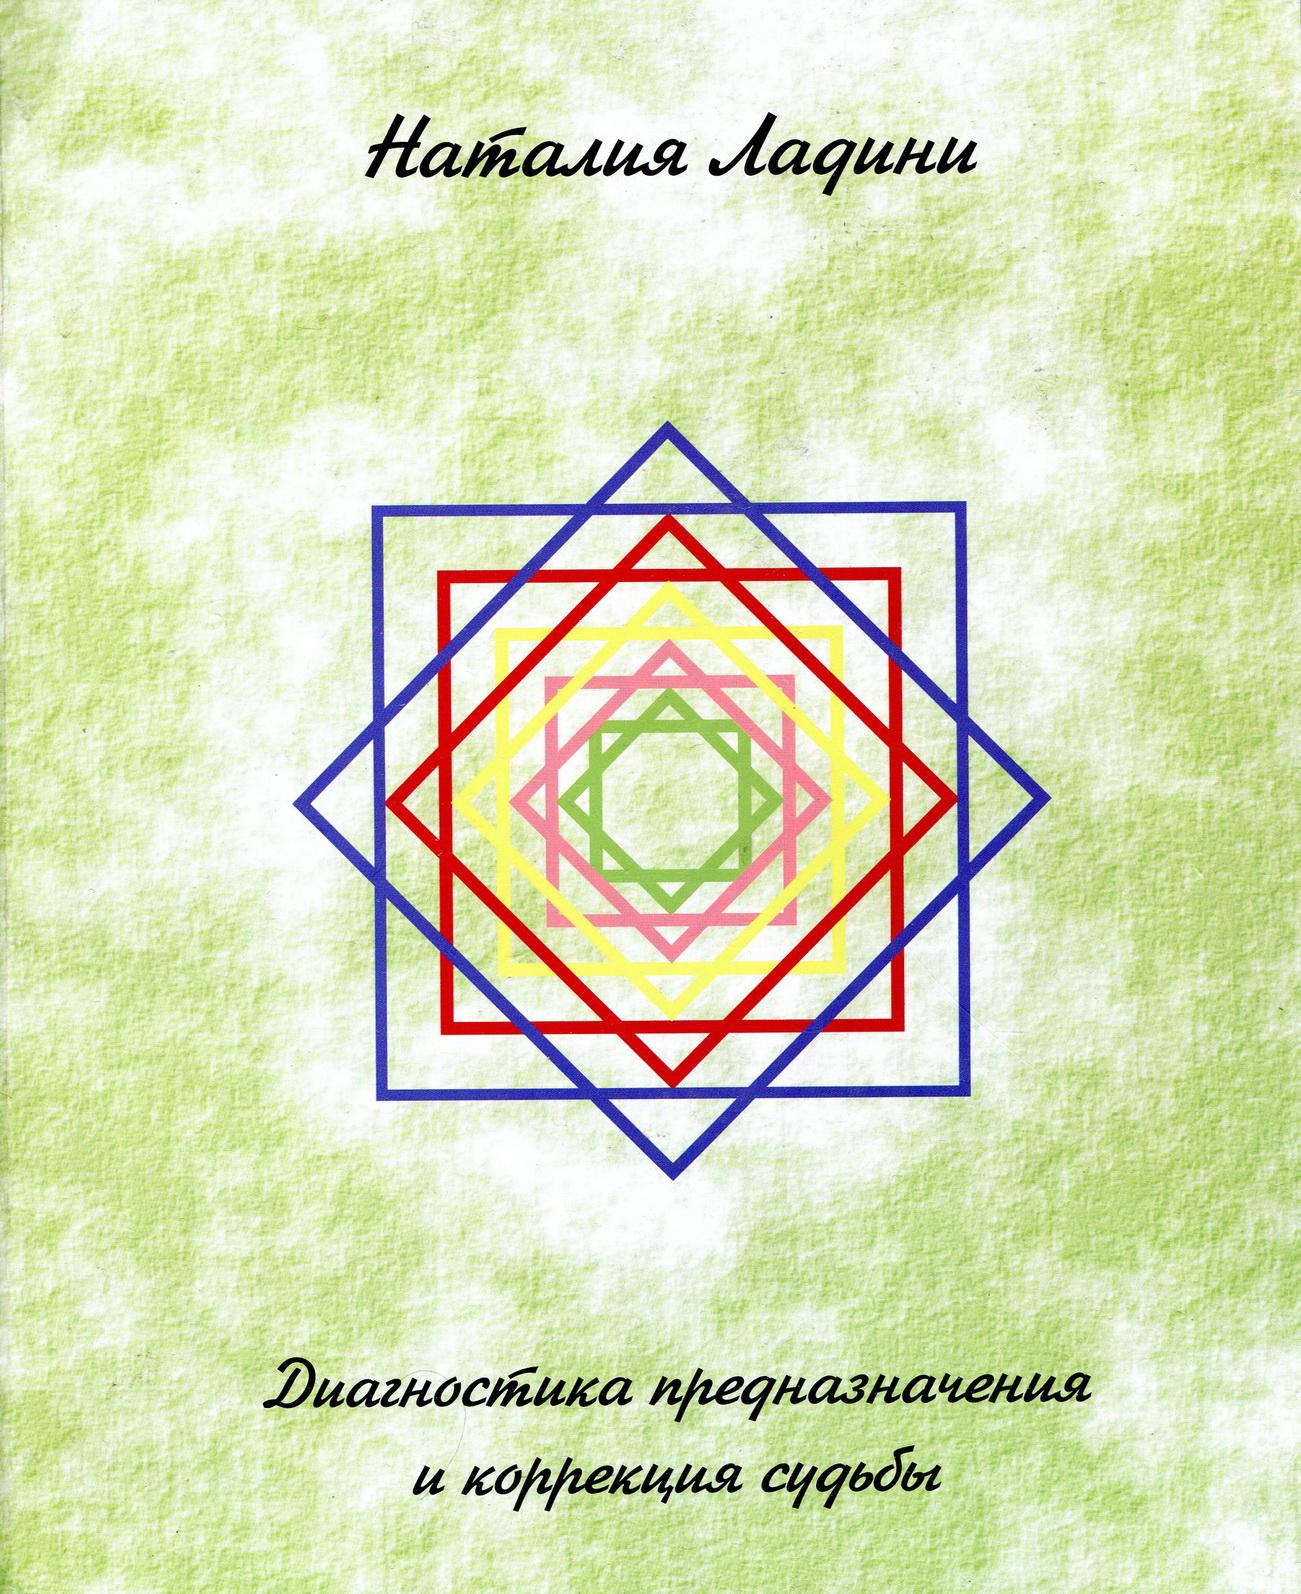 Наталія Ладіні - книга